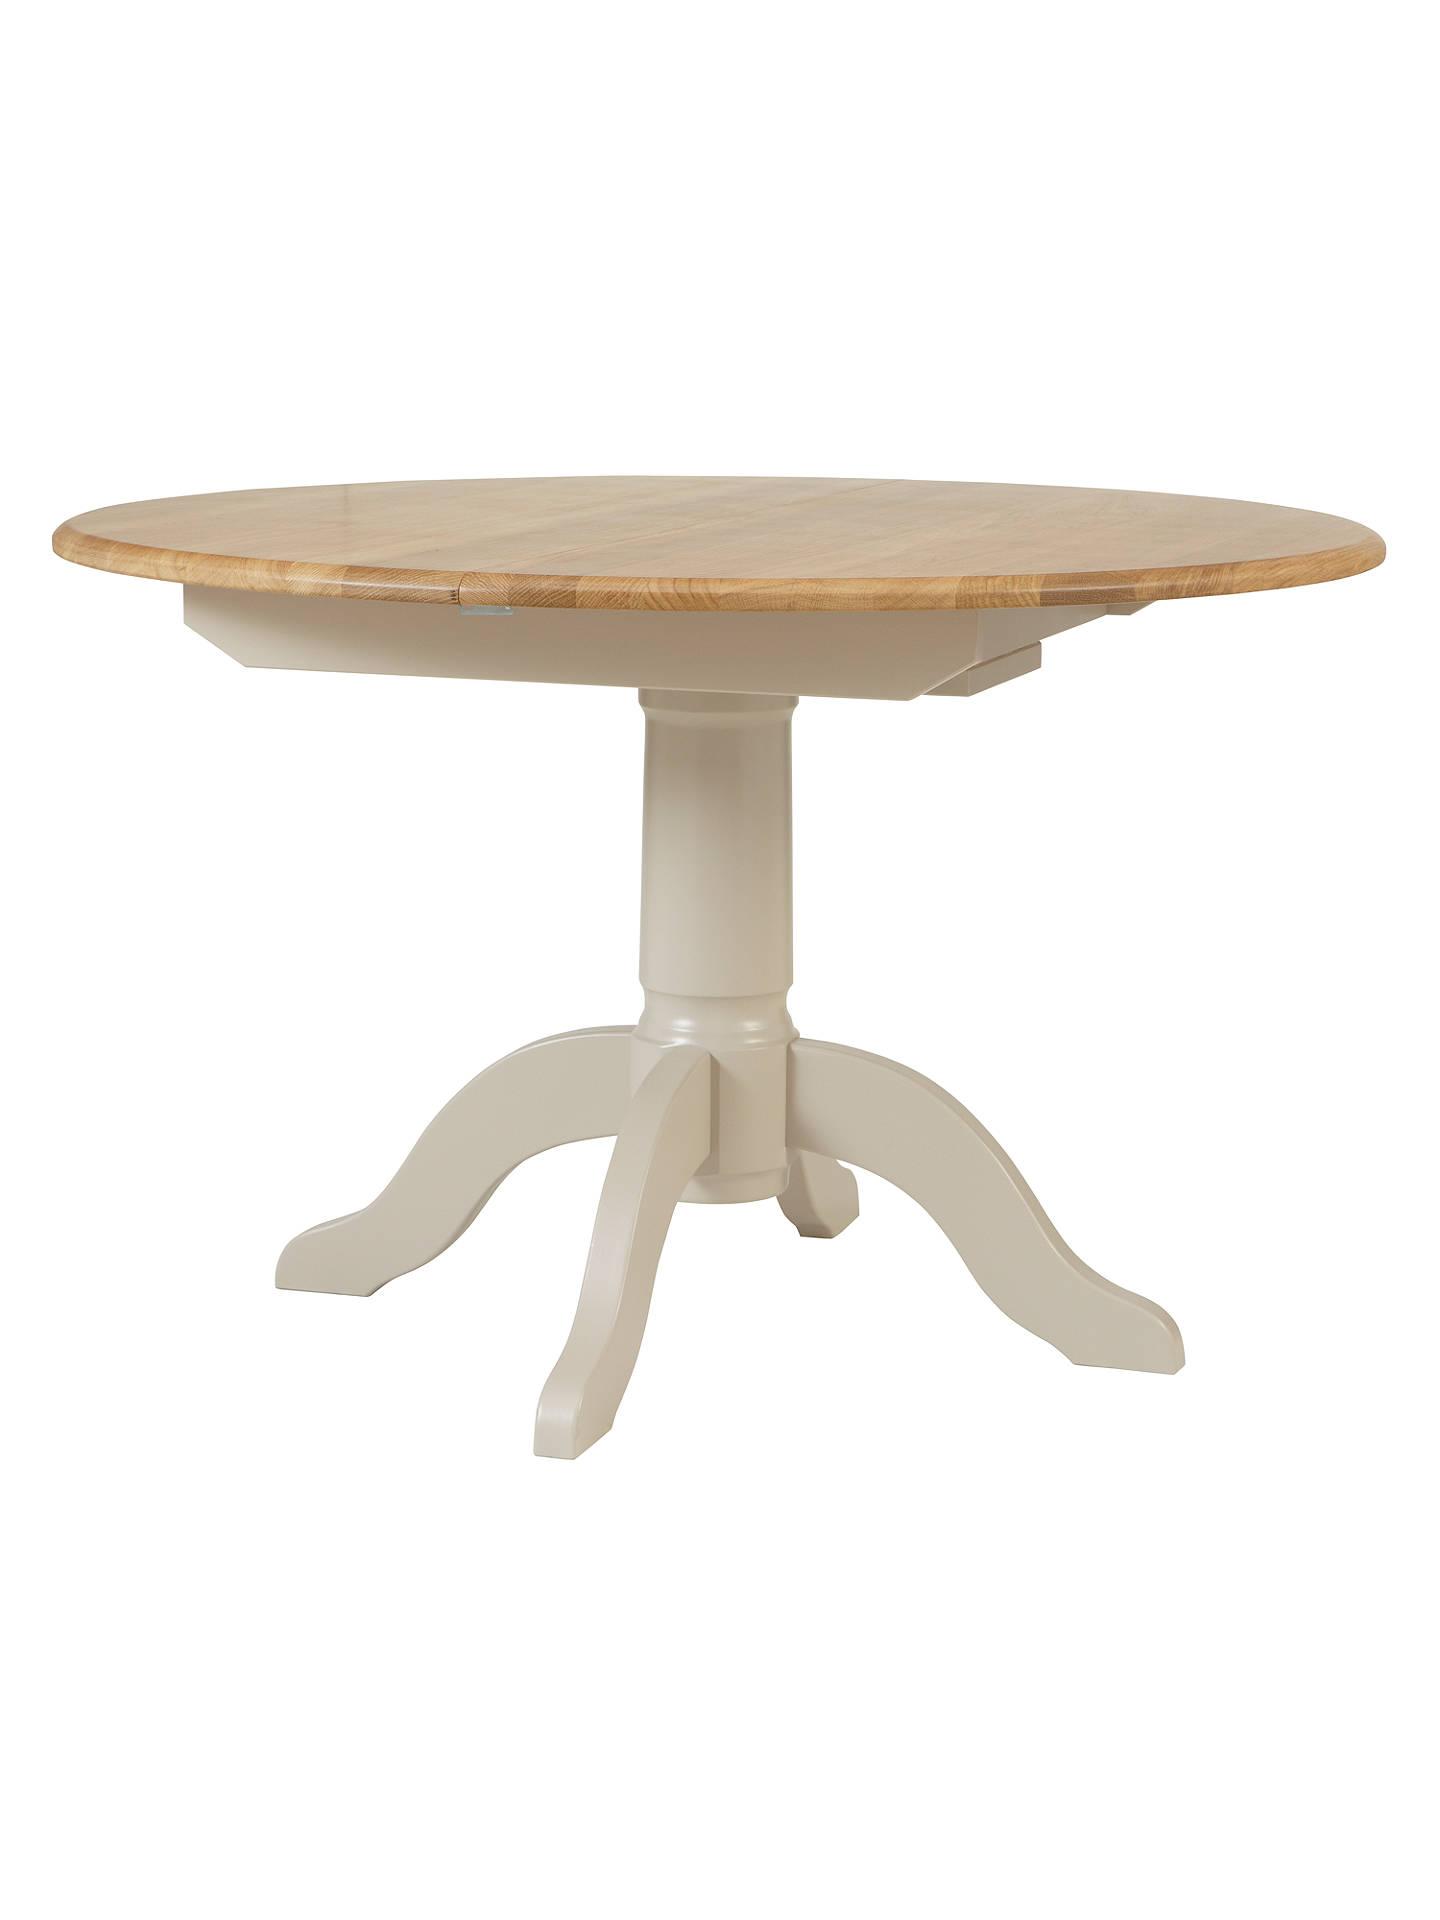 john lewis partners regent round 4 6 seater extending dining table fsc certified oak at. Black Bedroom Furniture Sets. Home Design Ideas